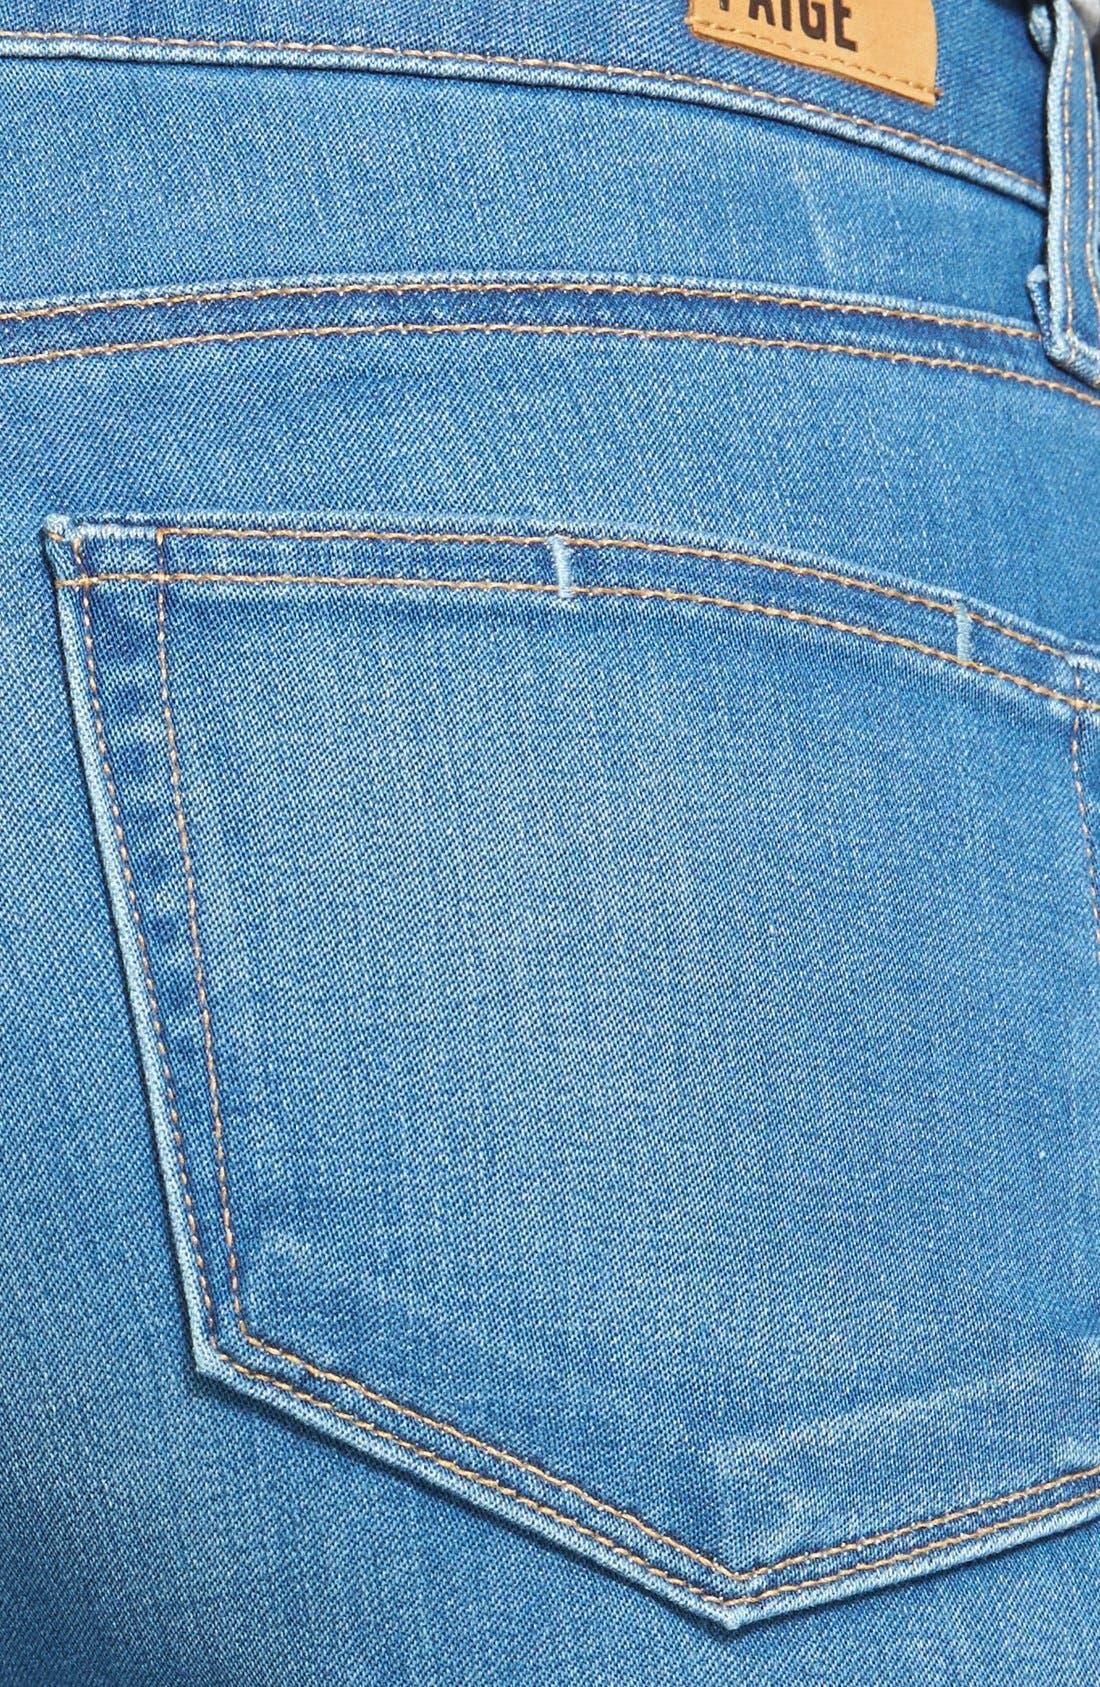 Alternate Image 3  - Paige Denim 'Hoxton' Skinny Ankle Jeans (Halstead Blue)